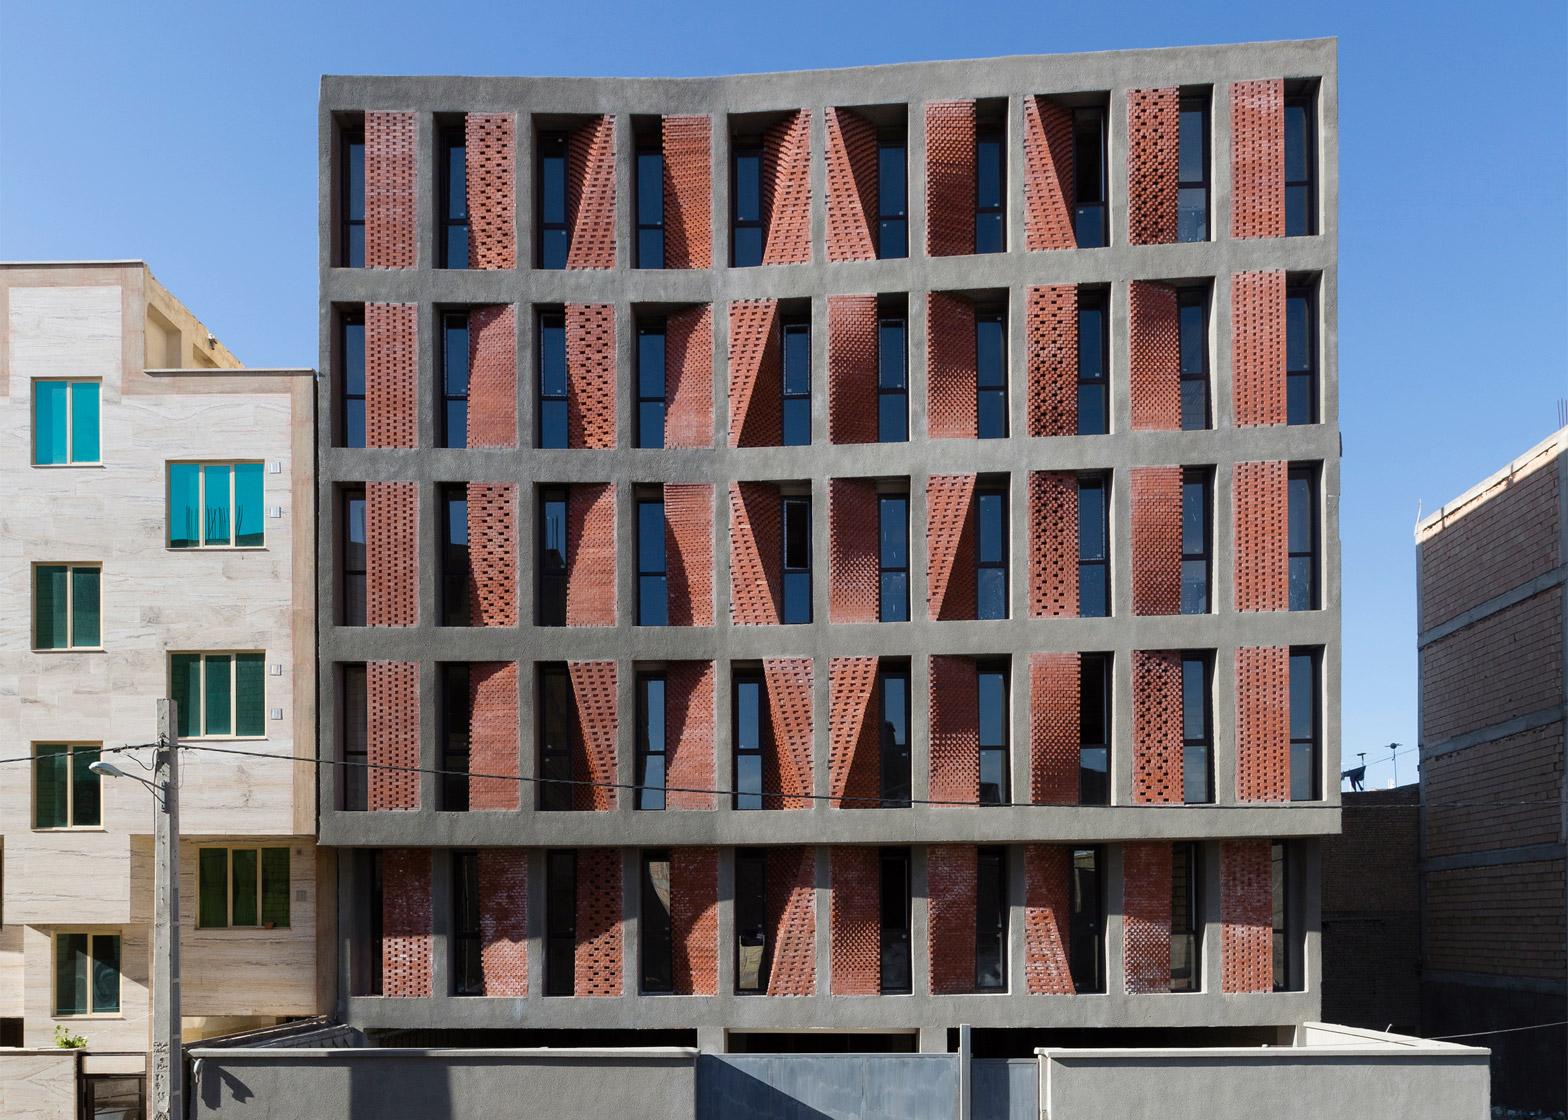 kahrizak-residential-building-caat-studio-tehran-iran-parham-taghioff_dezeen_1568_0